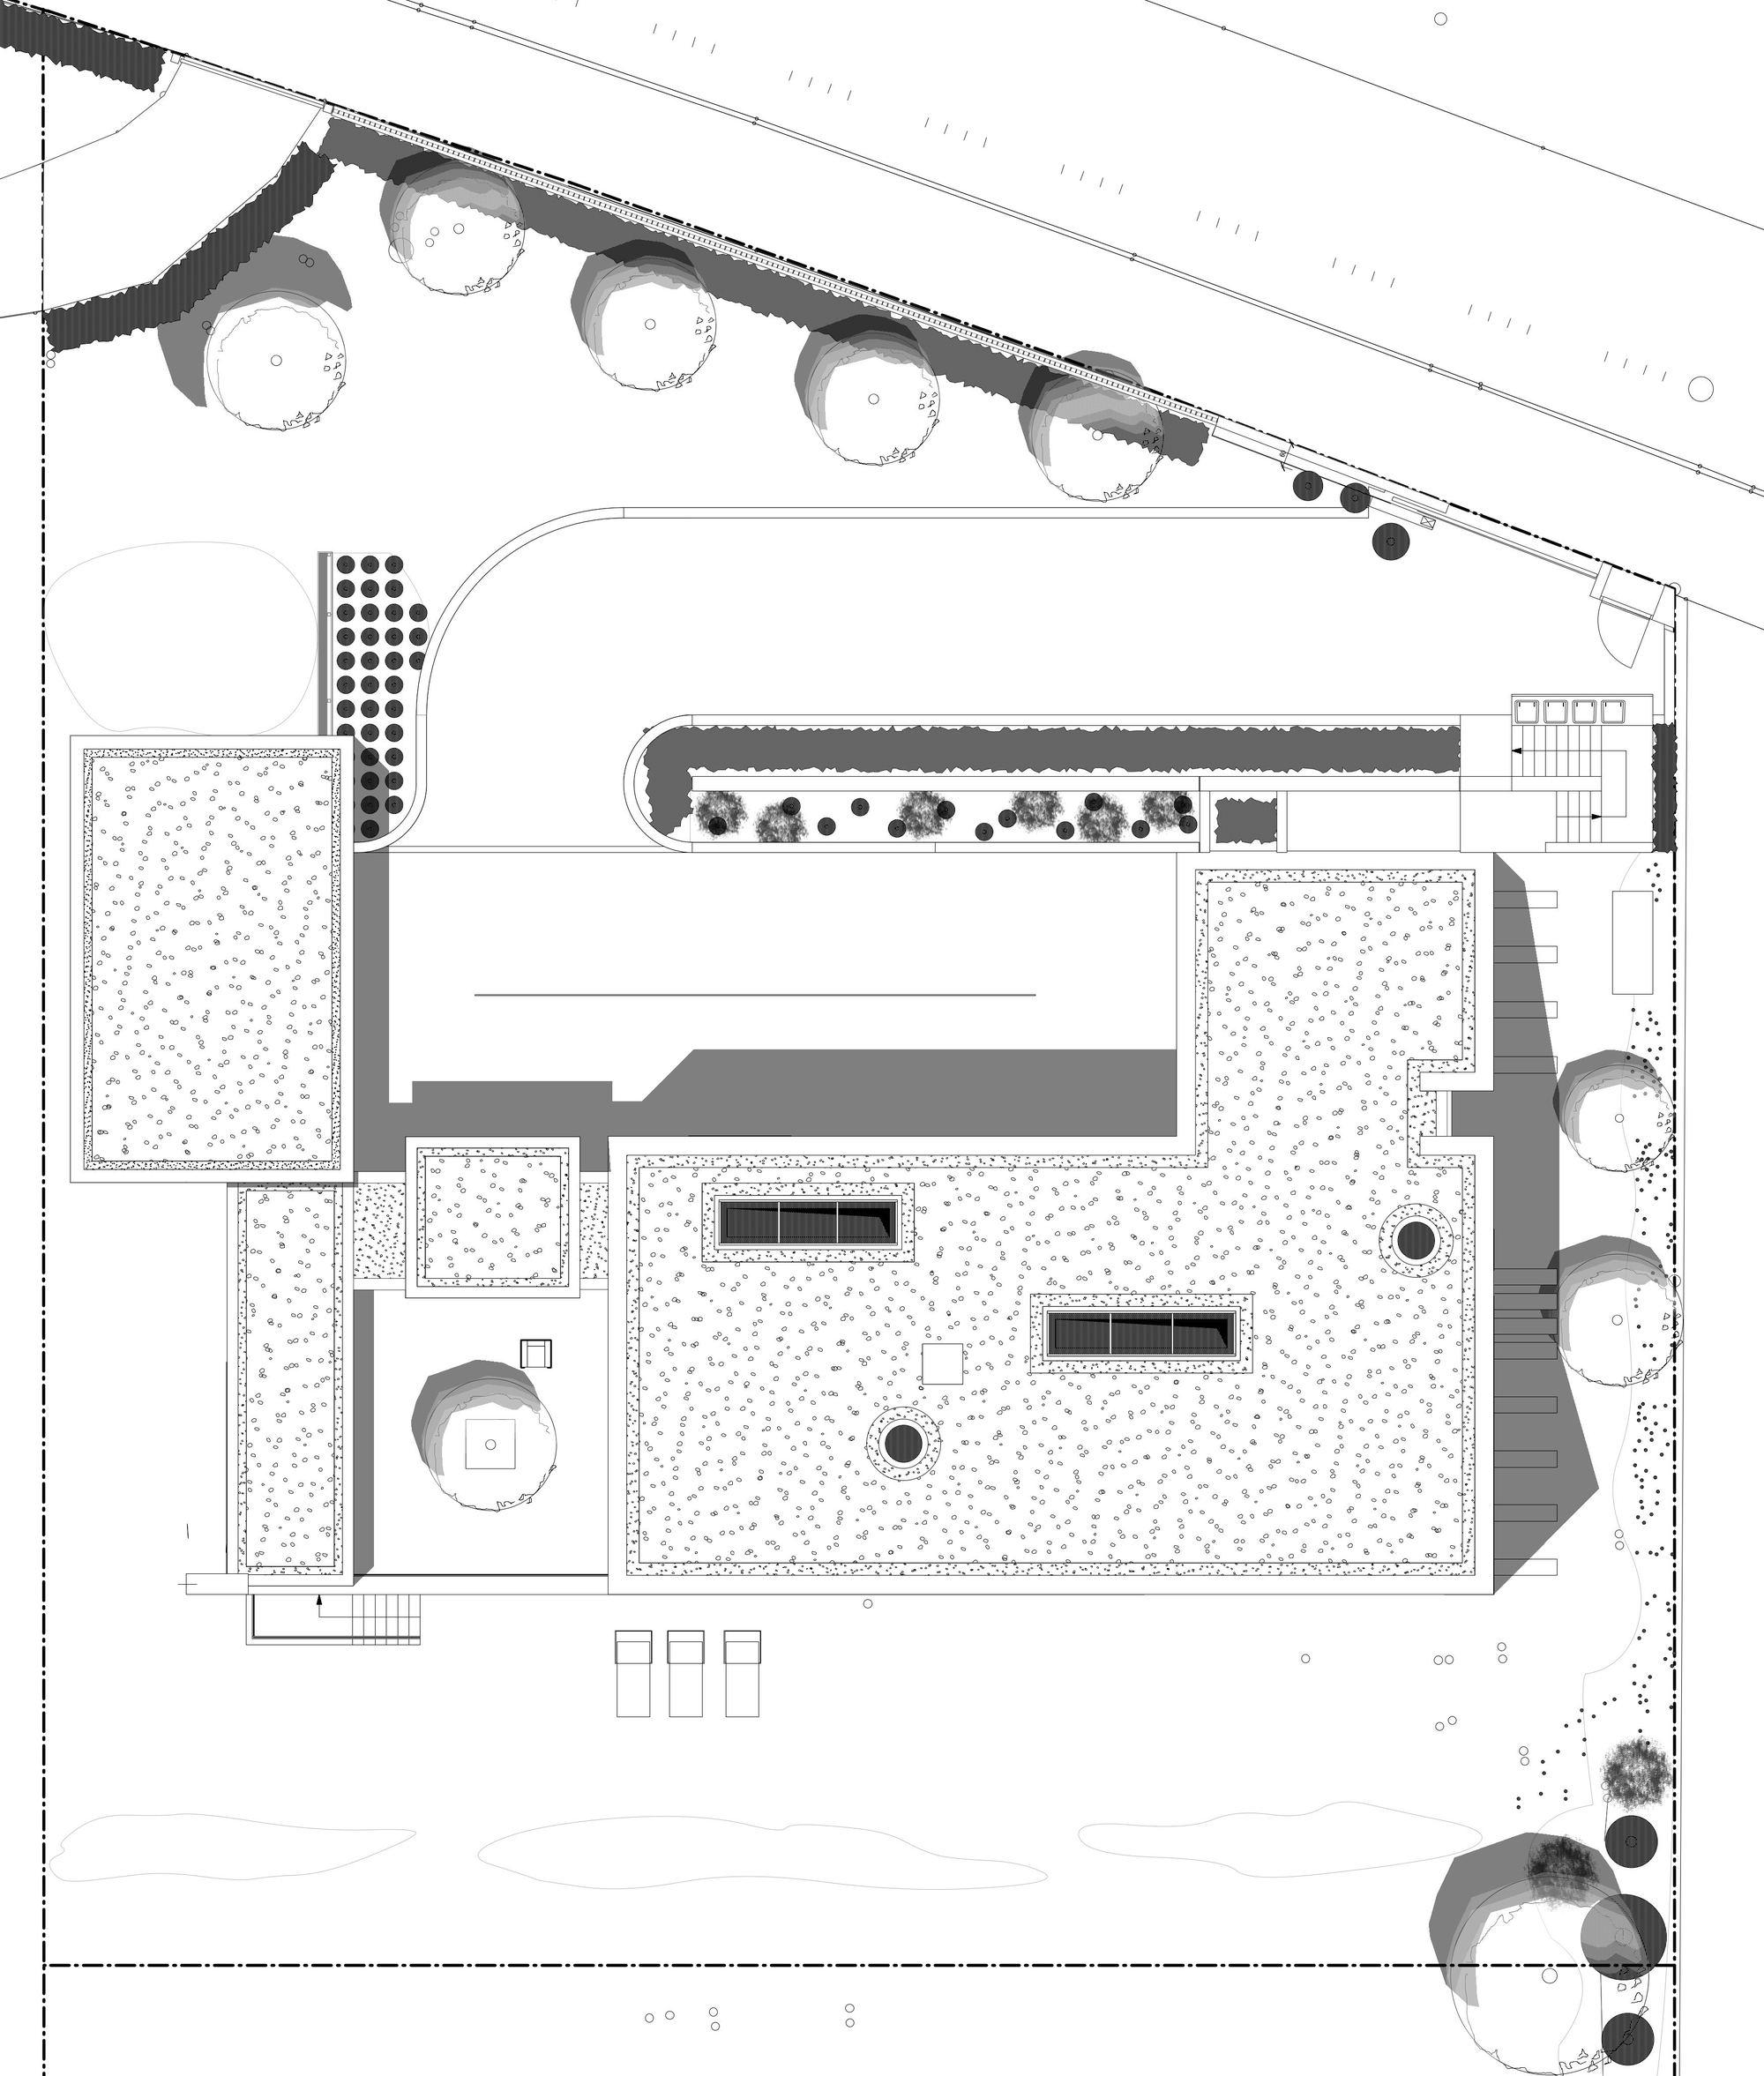 Galer a de casa fmb fuchs wacker architekten 30 - Fmb architekten ...